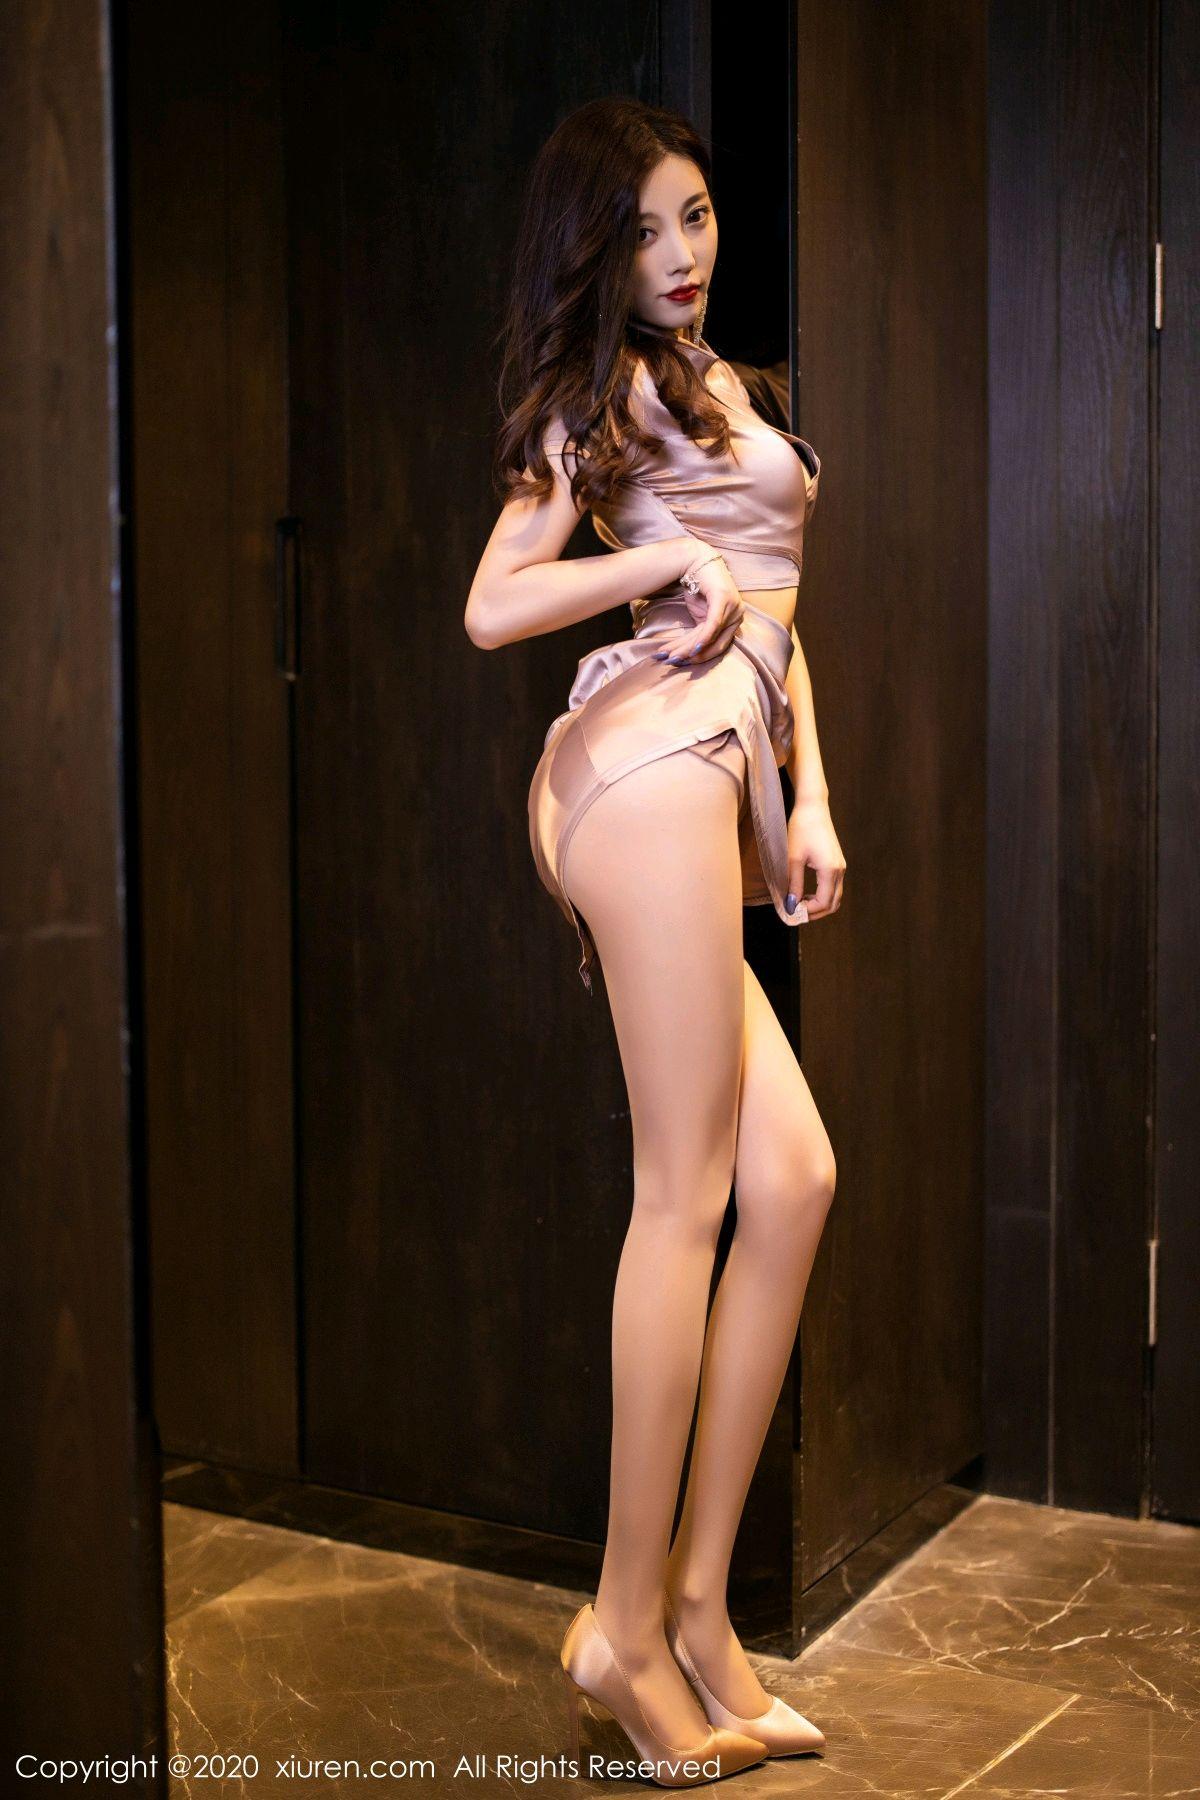 [XiuRen] Vol.2587 Yang Chen Chen 74P, Underwear, Xiuren, Yang Chen Chen